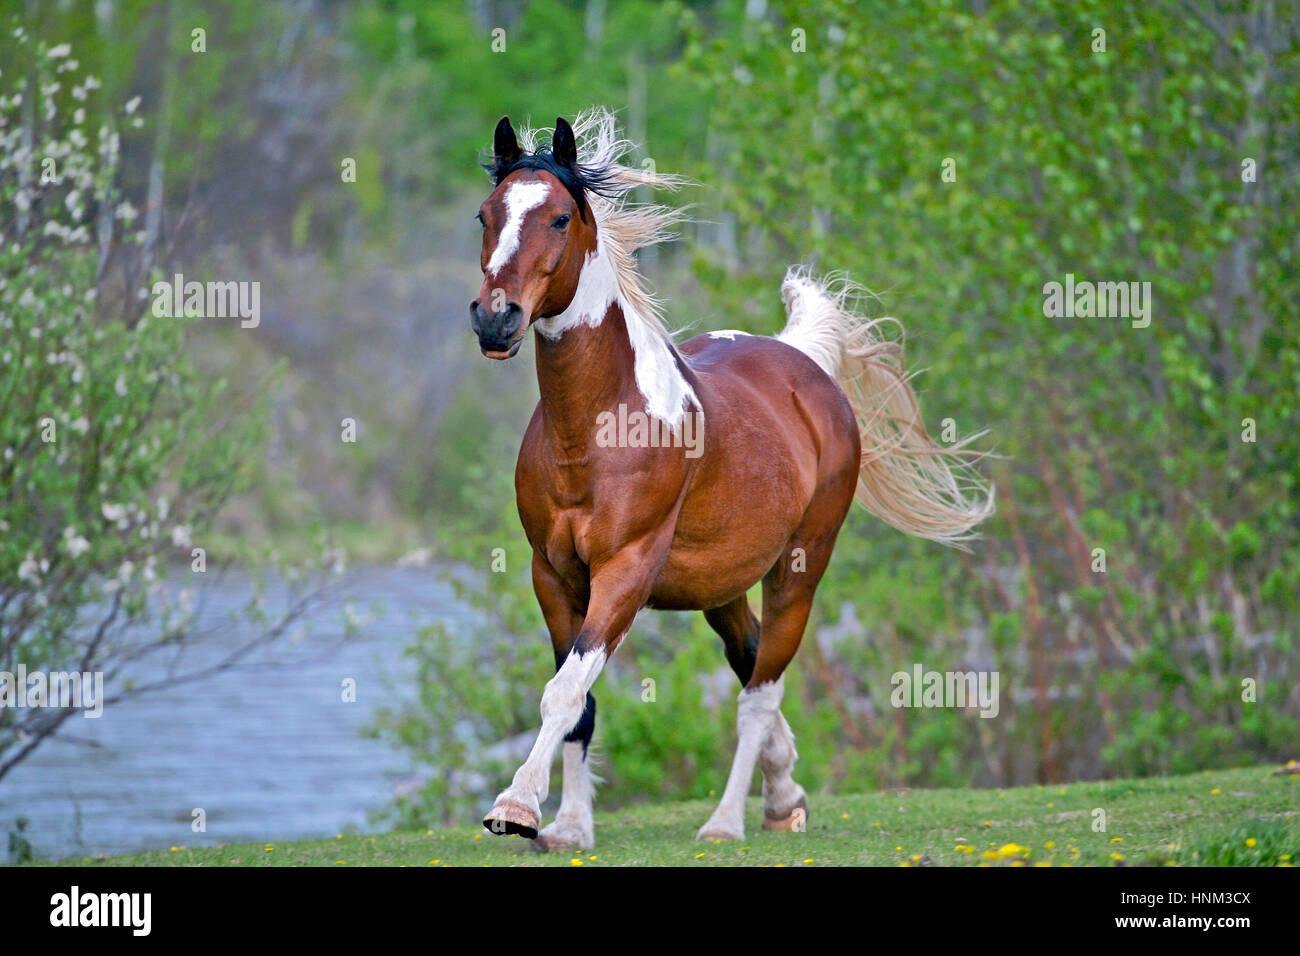 Pinto Arabian  Gelding running in spring meadow - Stock Image